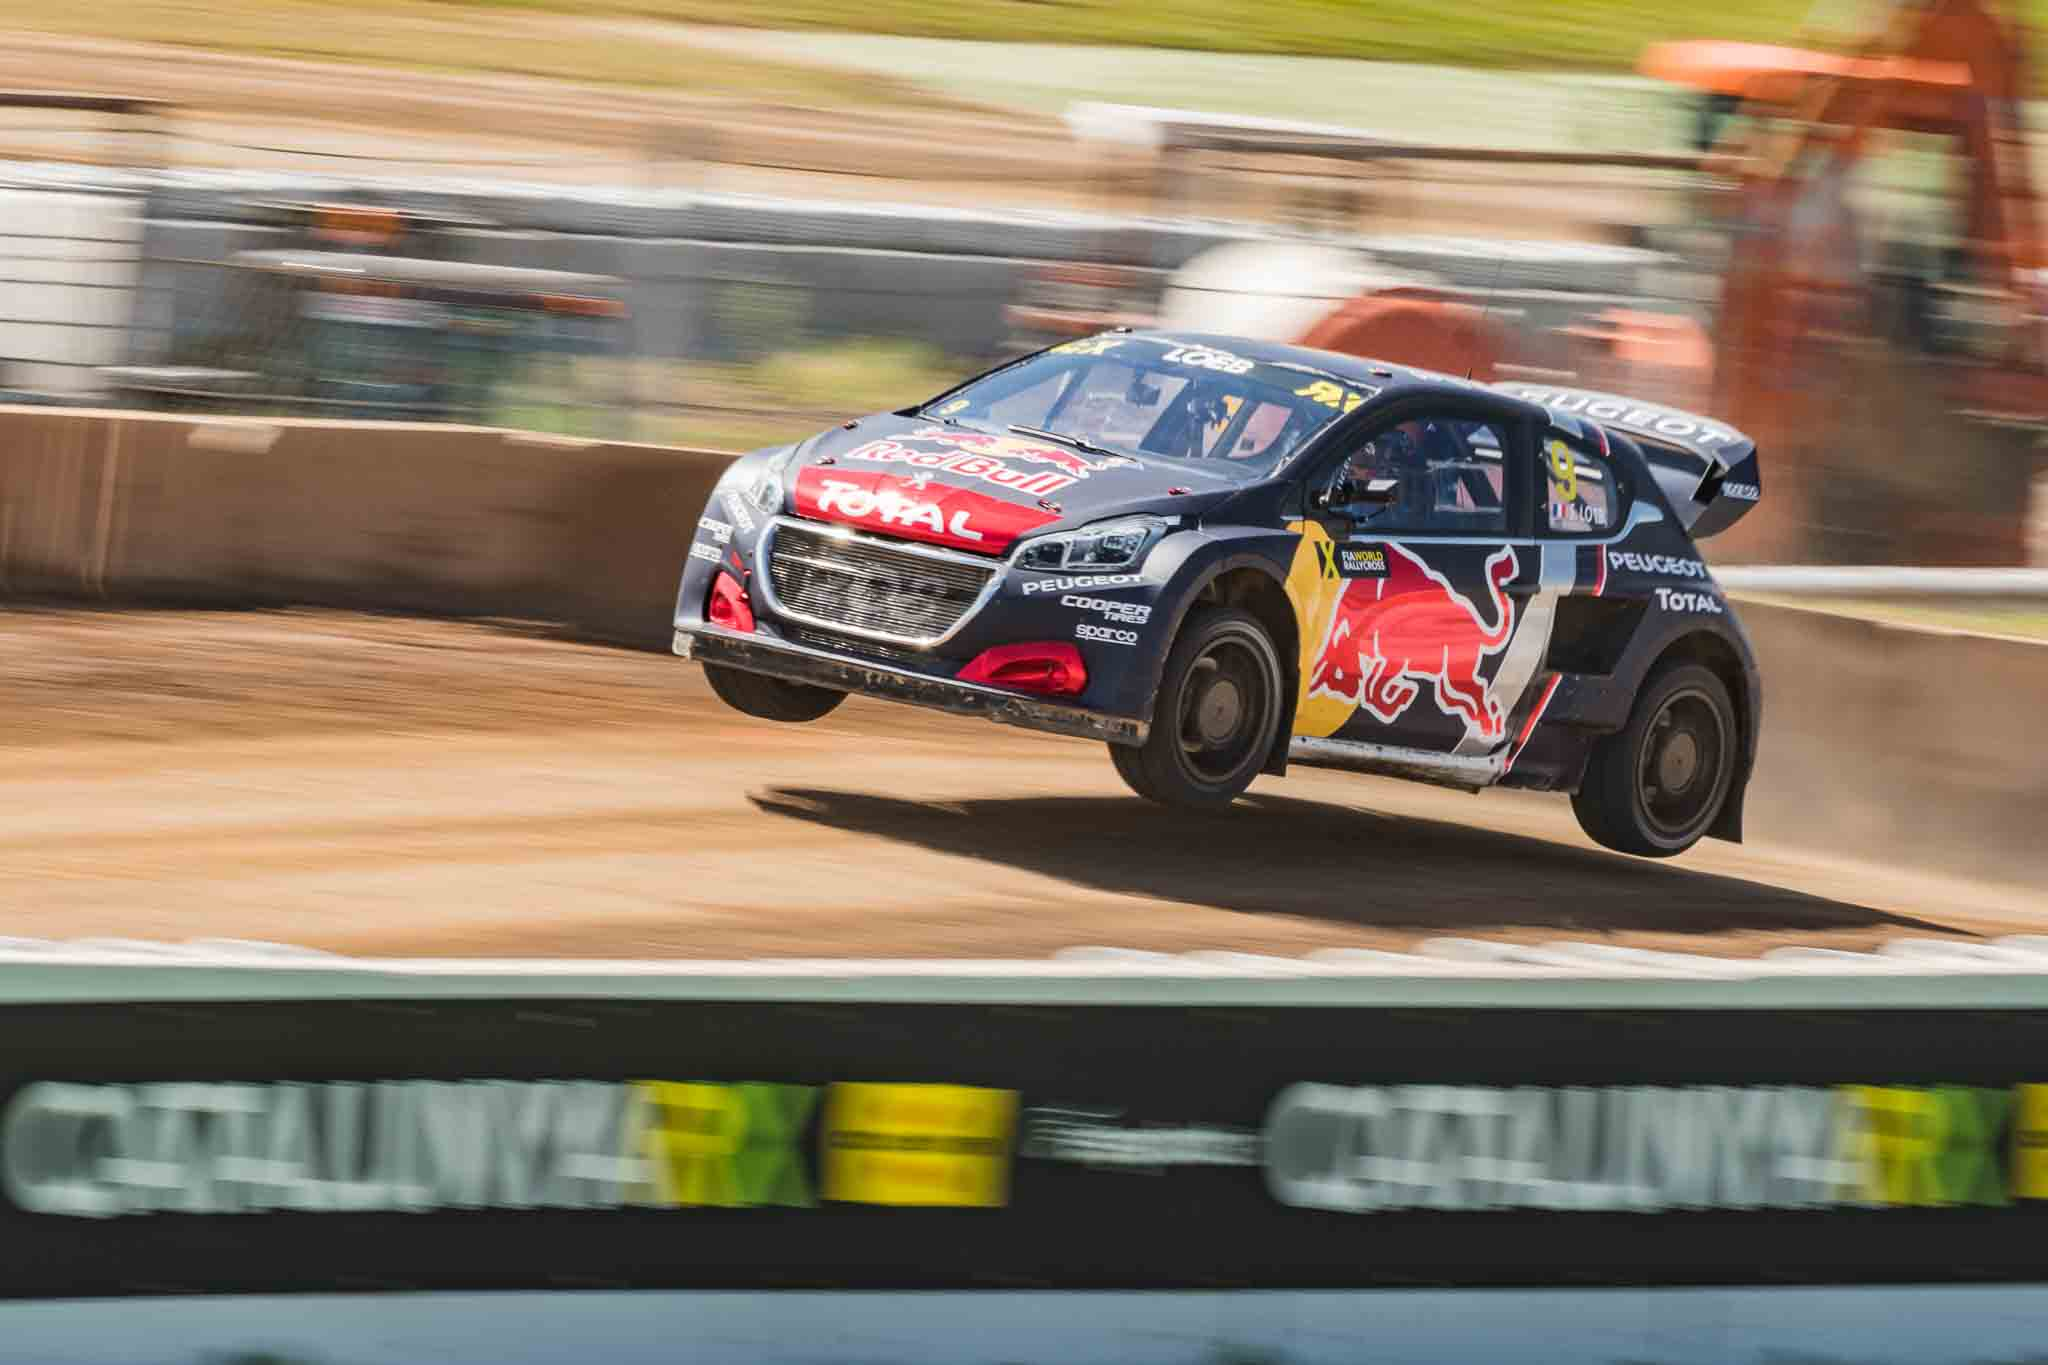 Fotografia Motorsport